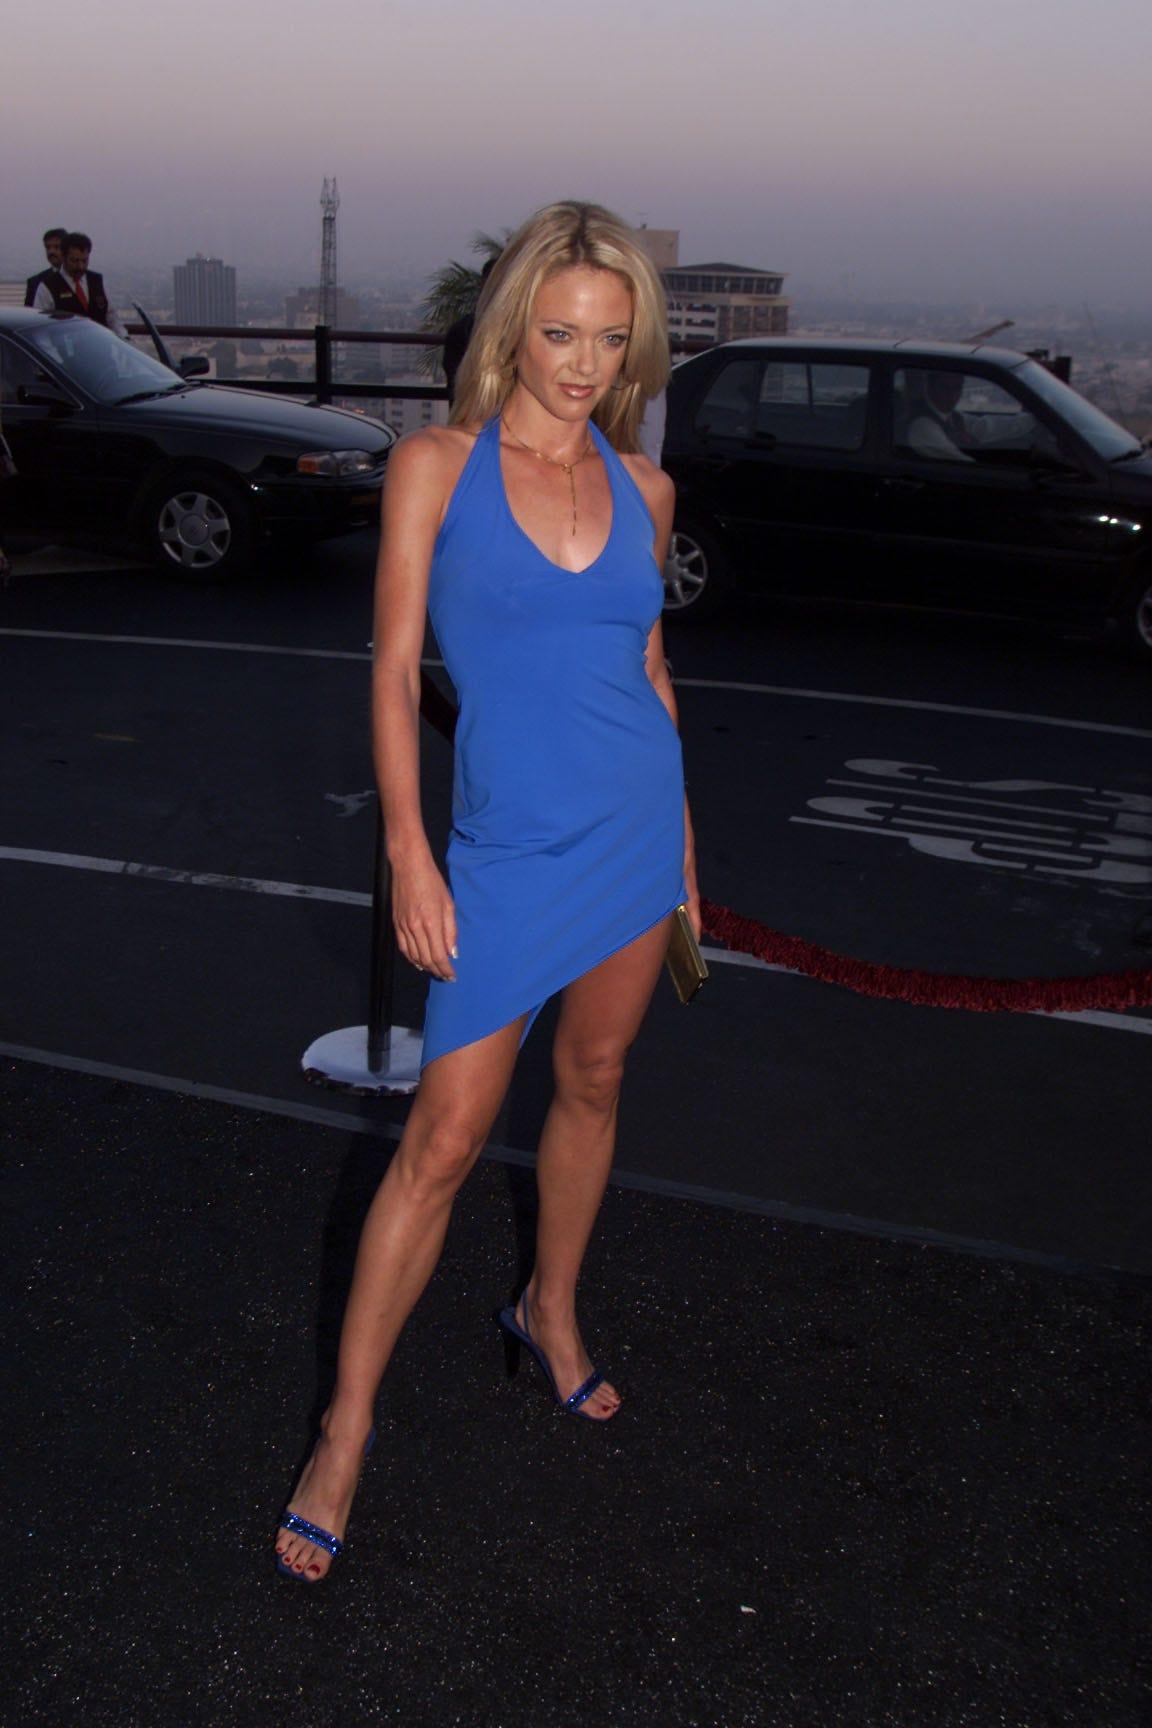 Celebrity Lisa Kelly nude (53 photos), Pussy, Paparazzi, Feet, lingerie 2018